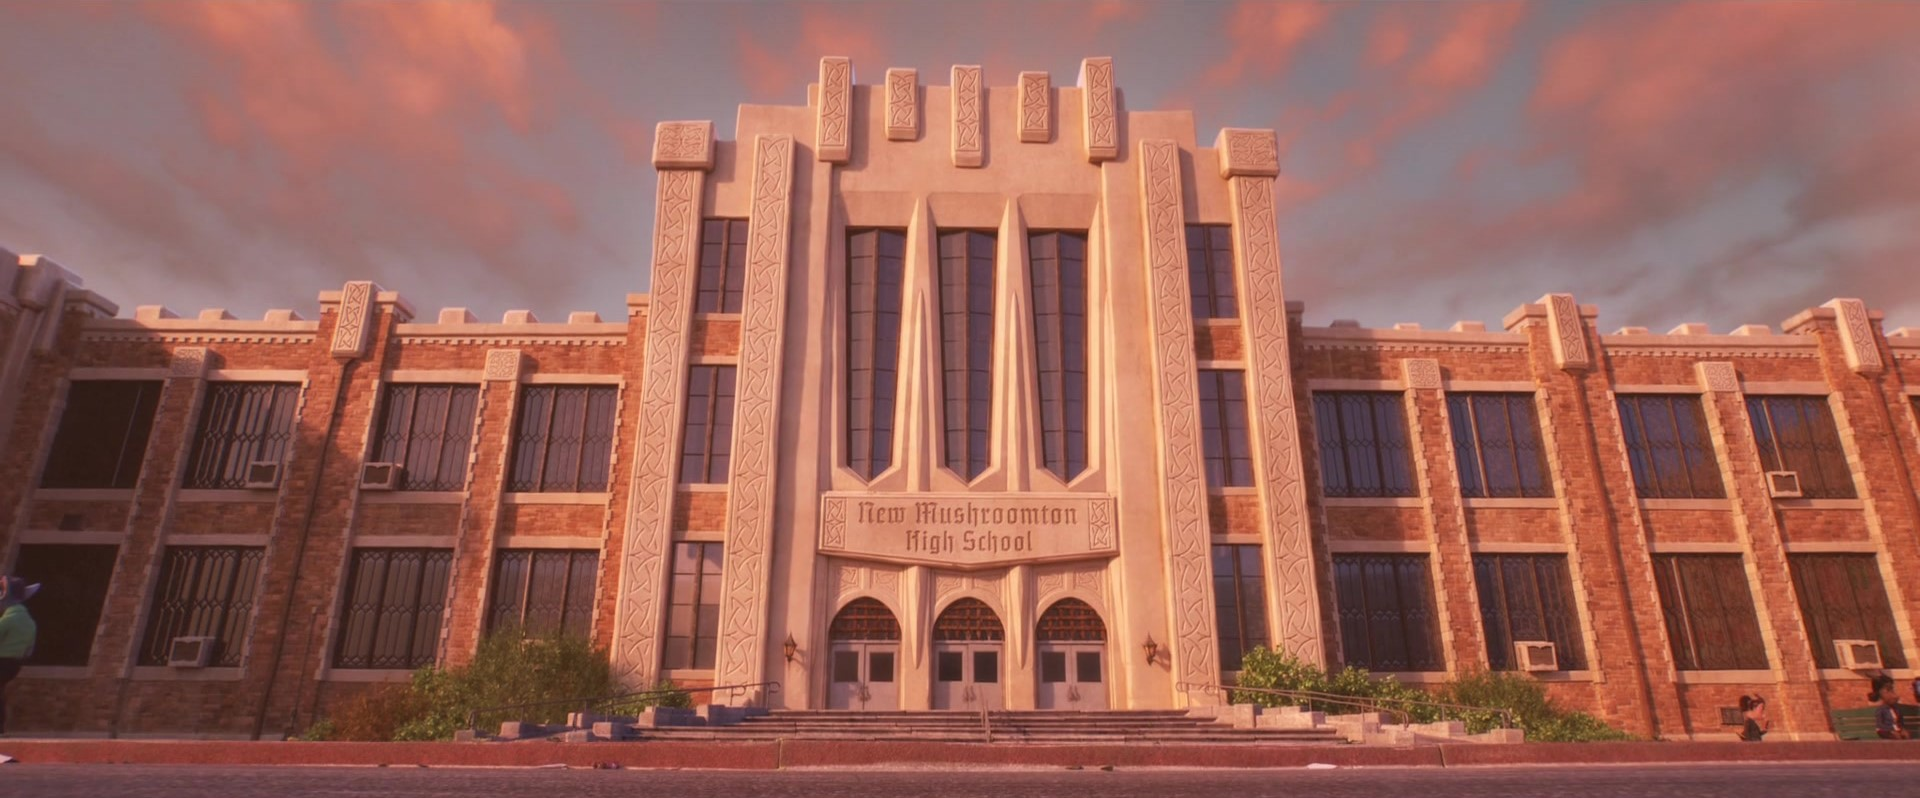 New Mushroomton High School